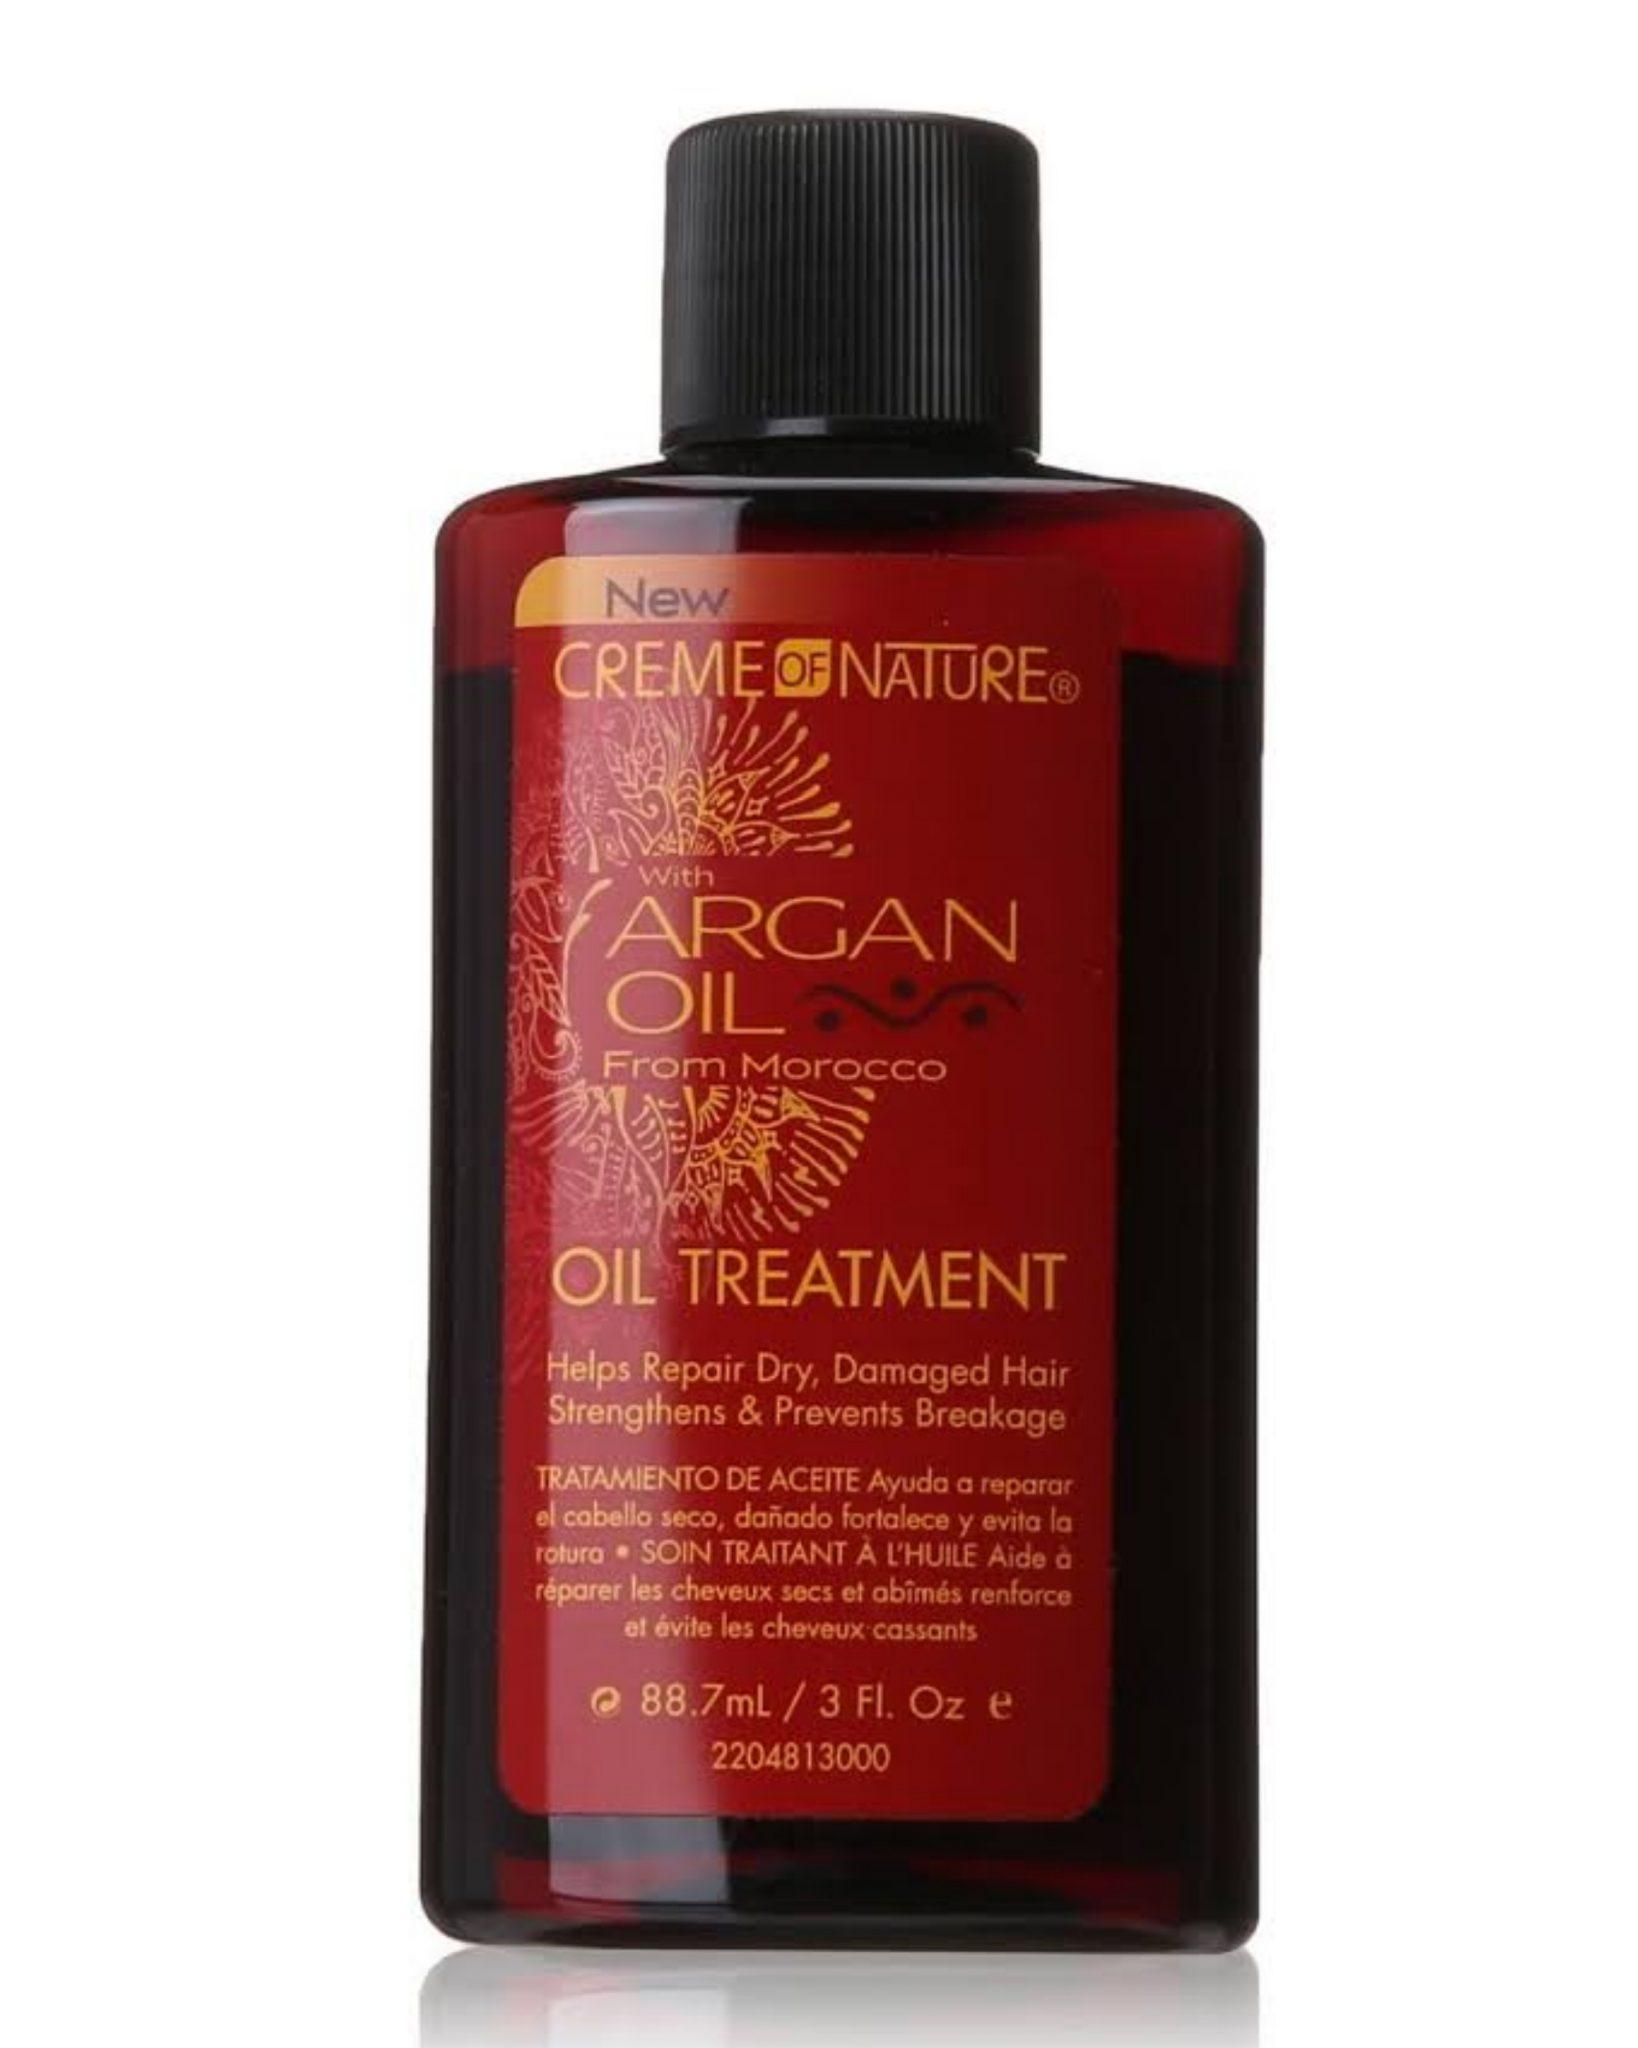 Creme of Nature Argan Oil Oil Treatment-3 oz